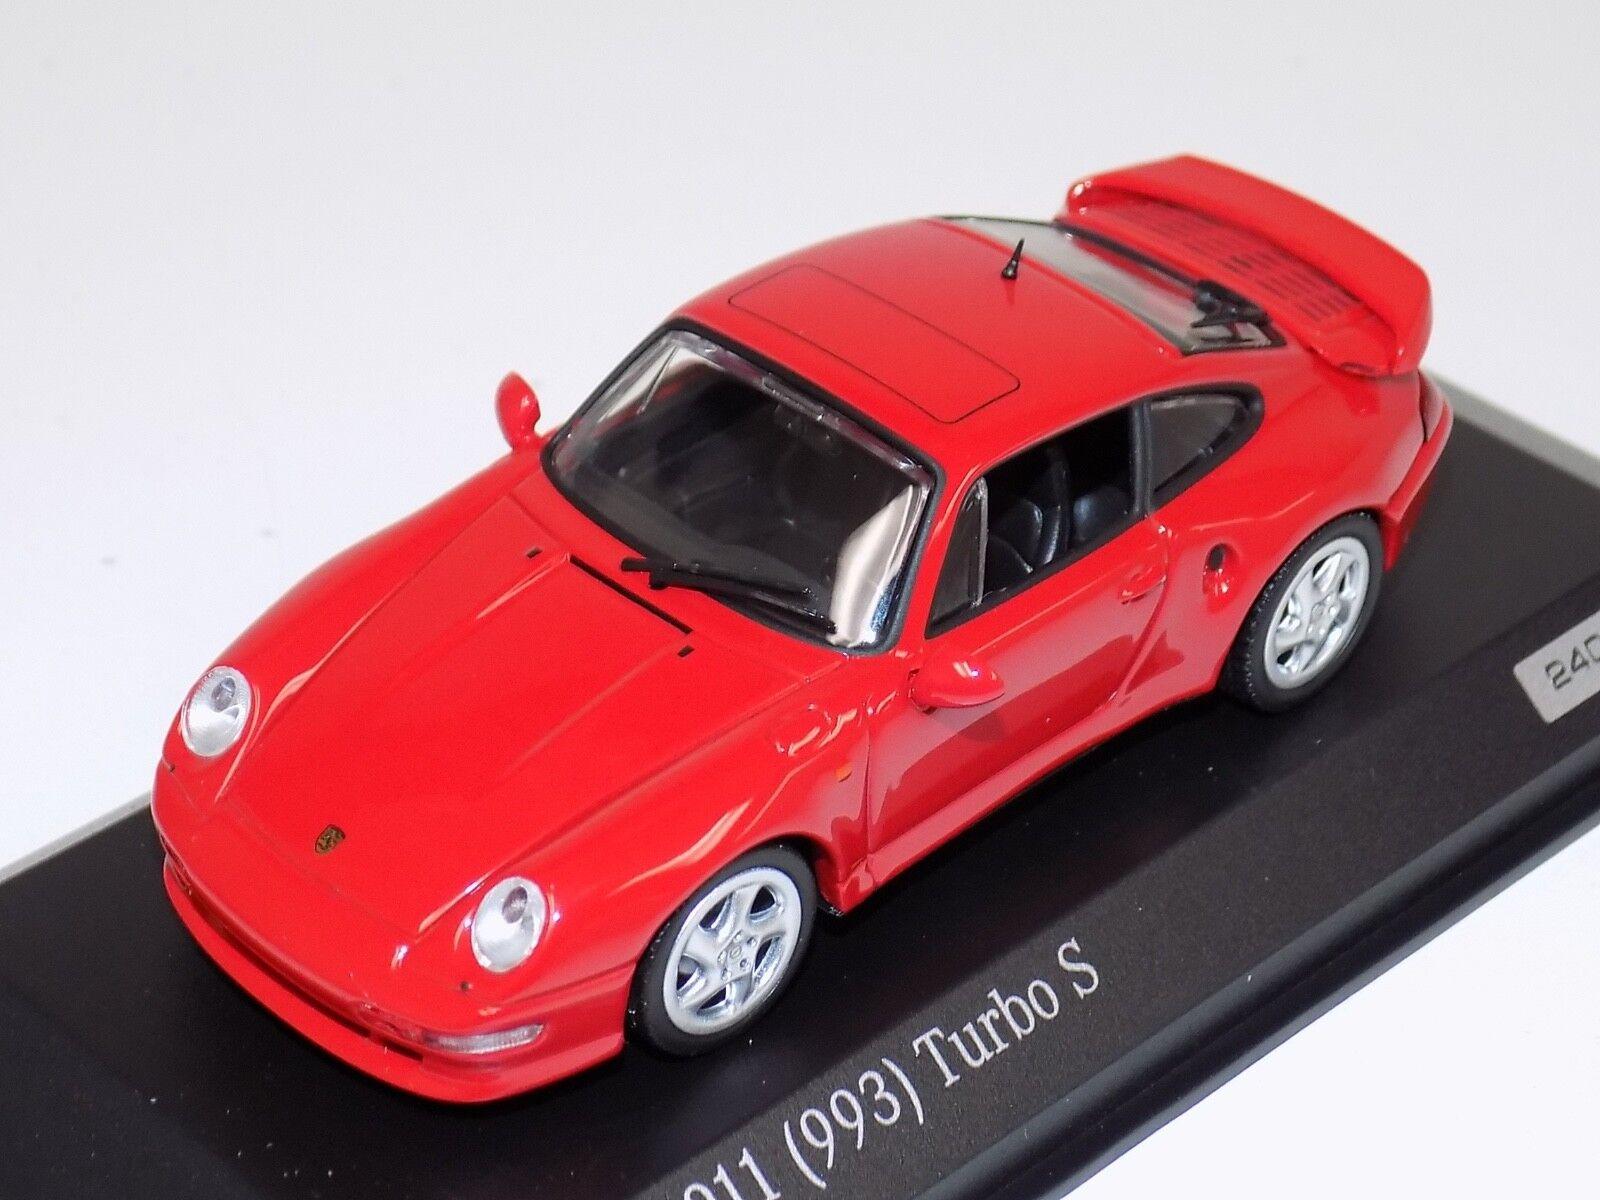 1 43 Minichamps Porsche 911  993  Turbo S in  Red  CA04316001